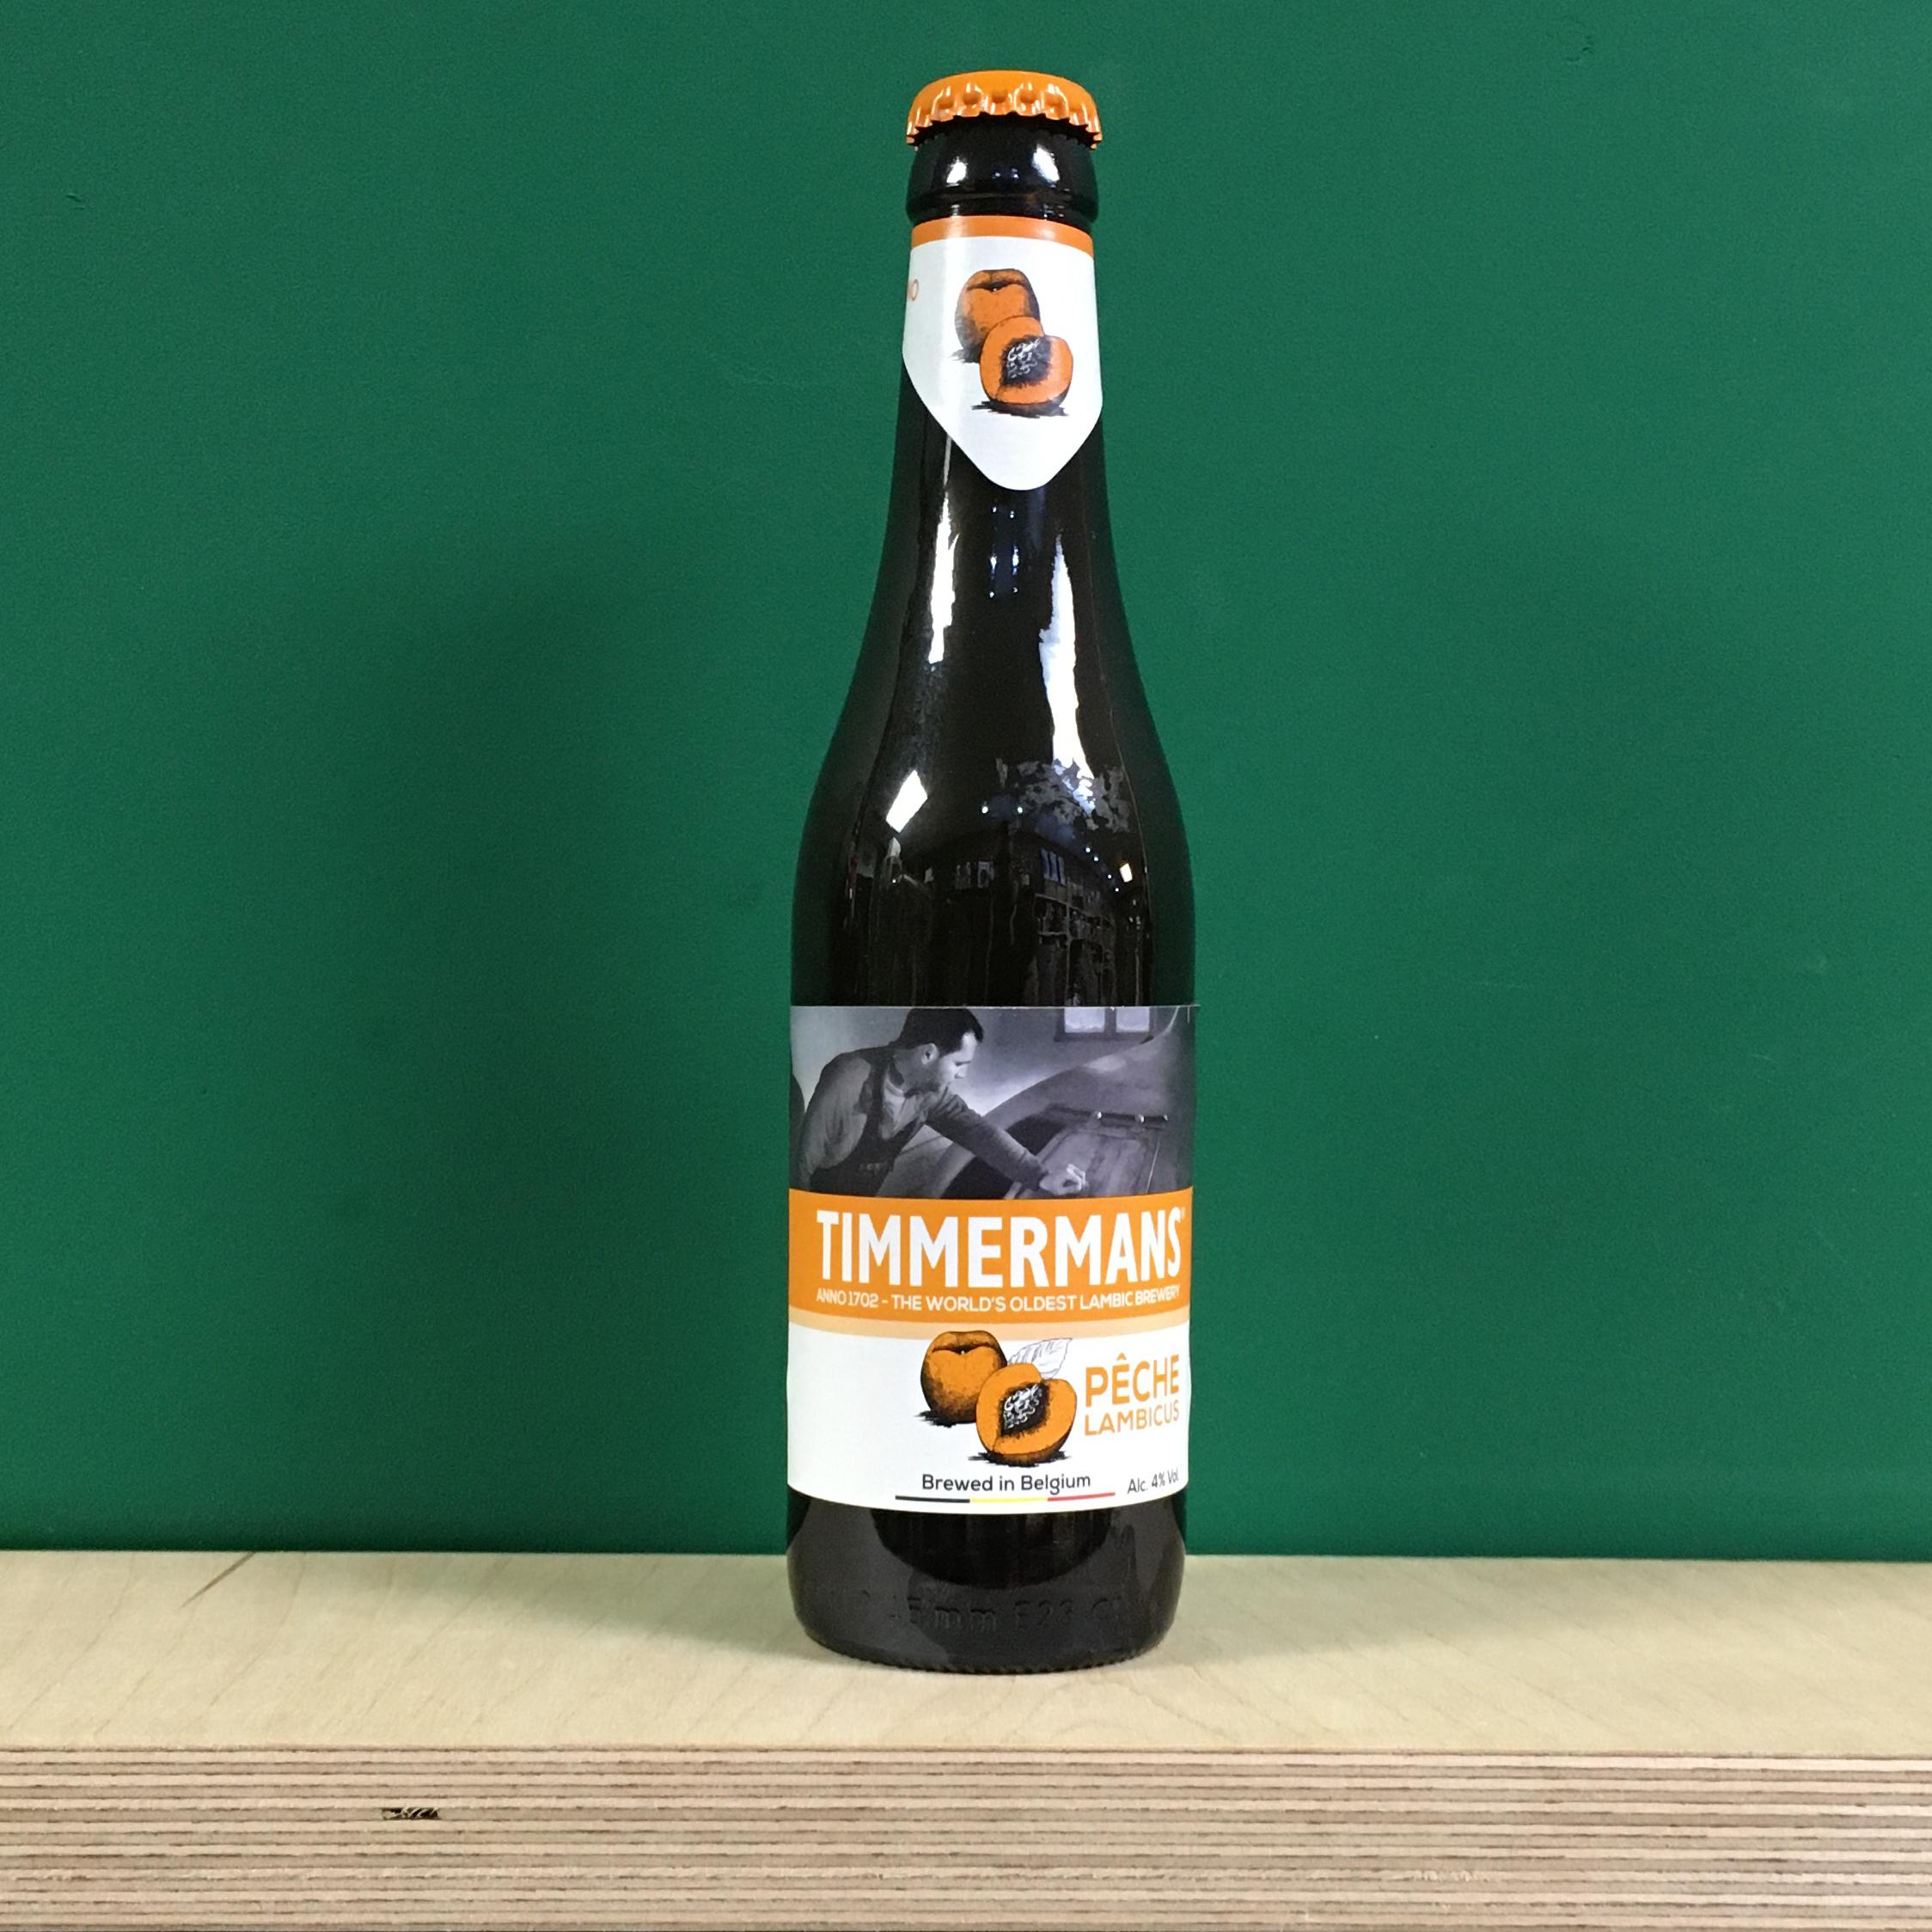 Timmermans Peche